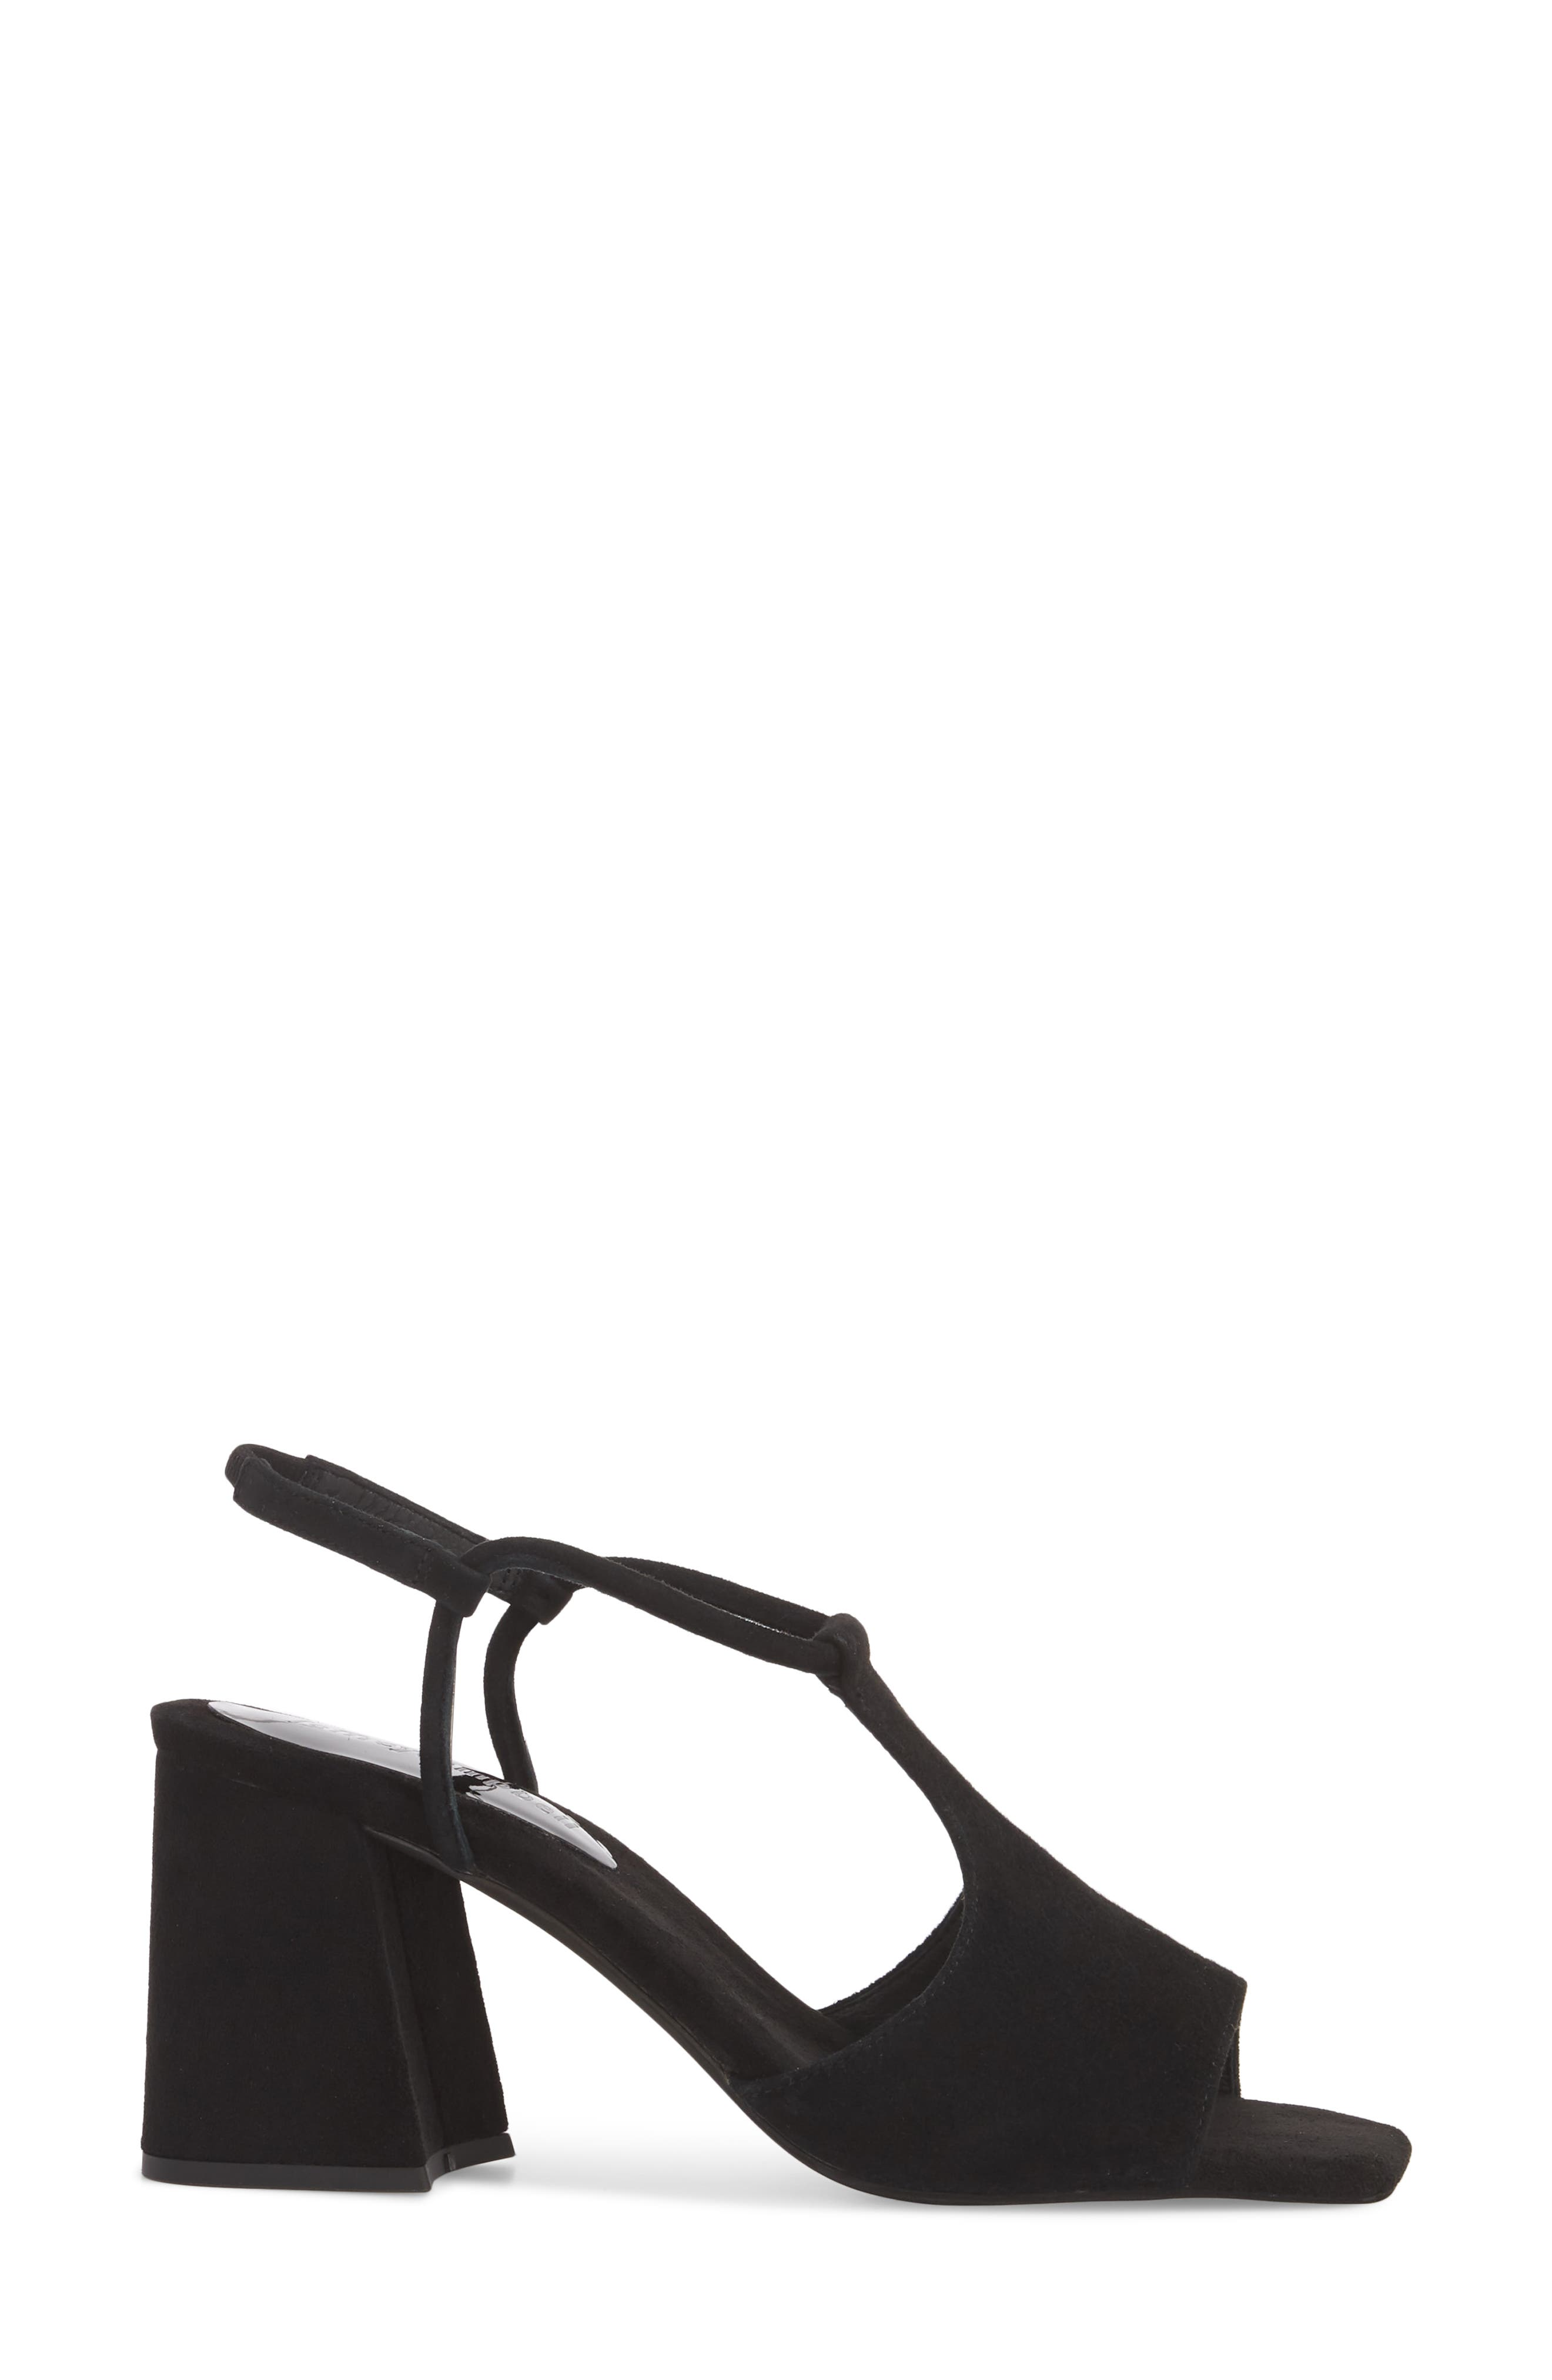 Mercedes Halter Sandal,                             Alternate thumbnail 3, color,                             Black Suede